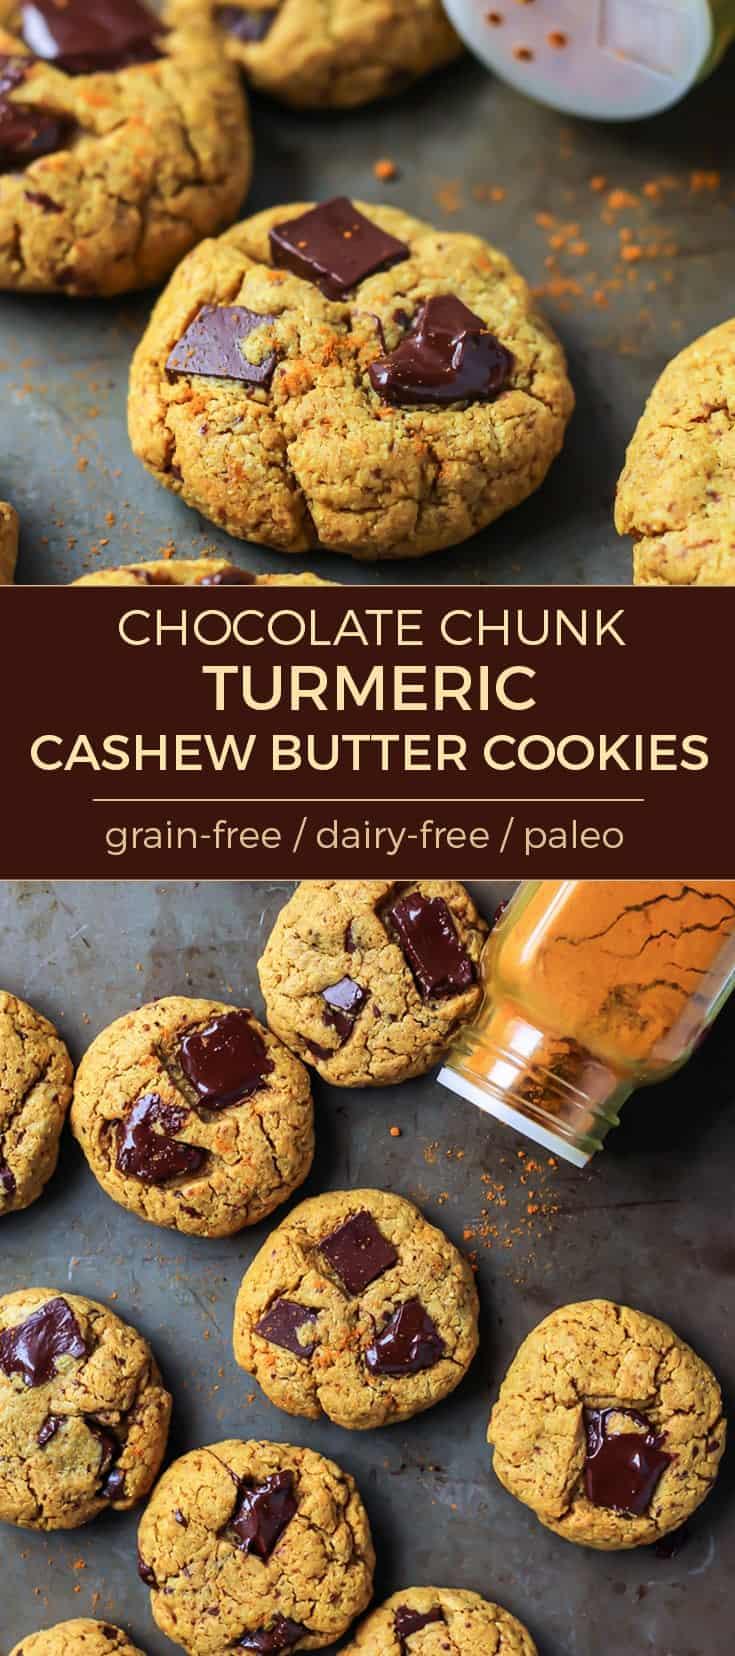 Chocolate Chunk Turmeric Cashew Butter Cookie grain free dairy free paleo pinterest image